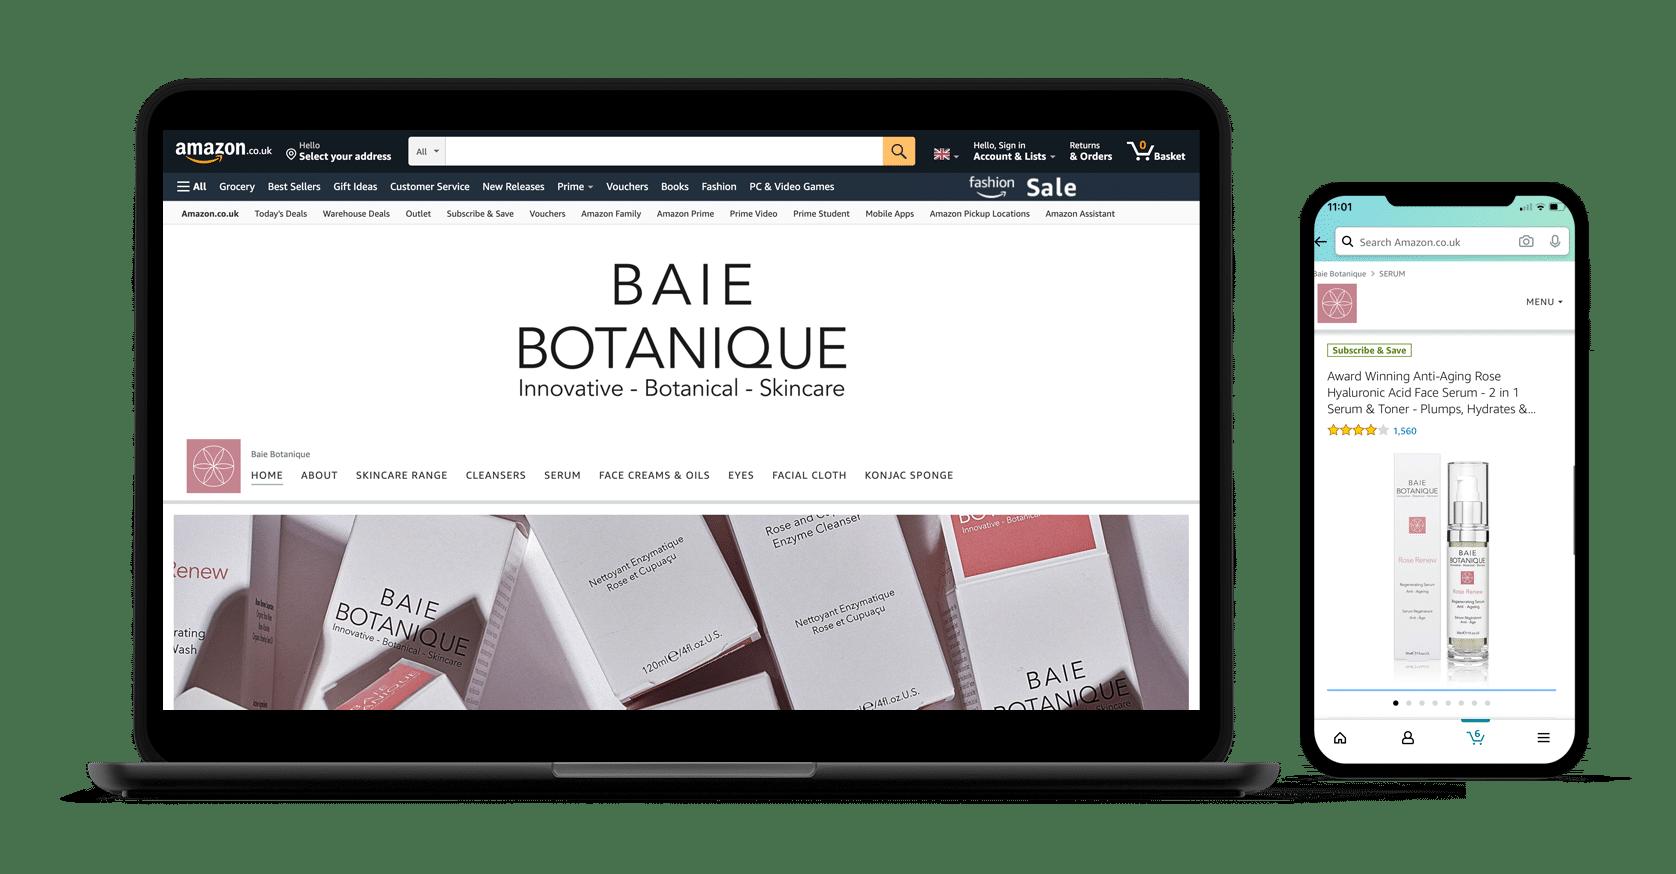 Baie Botanique Amazon store on desktop and mobile